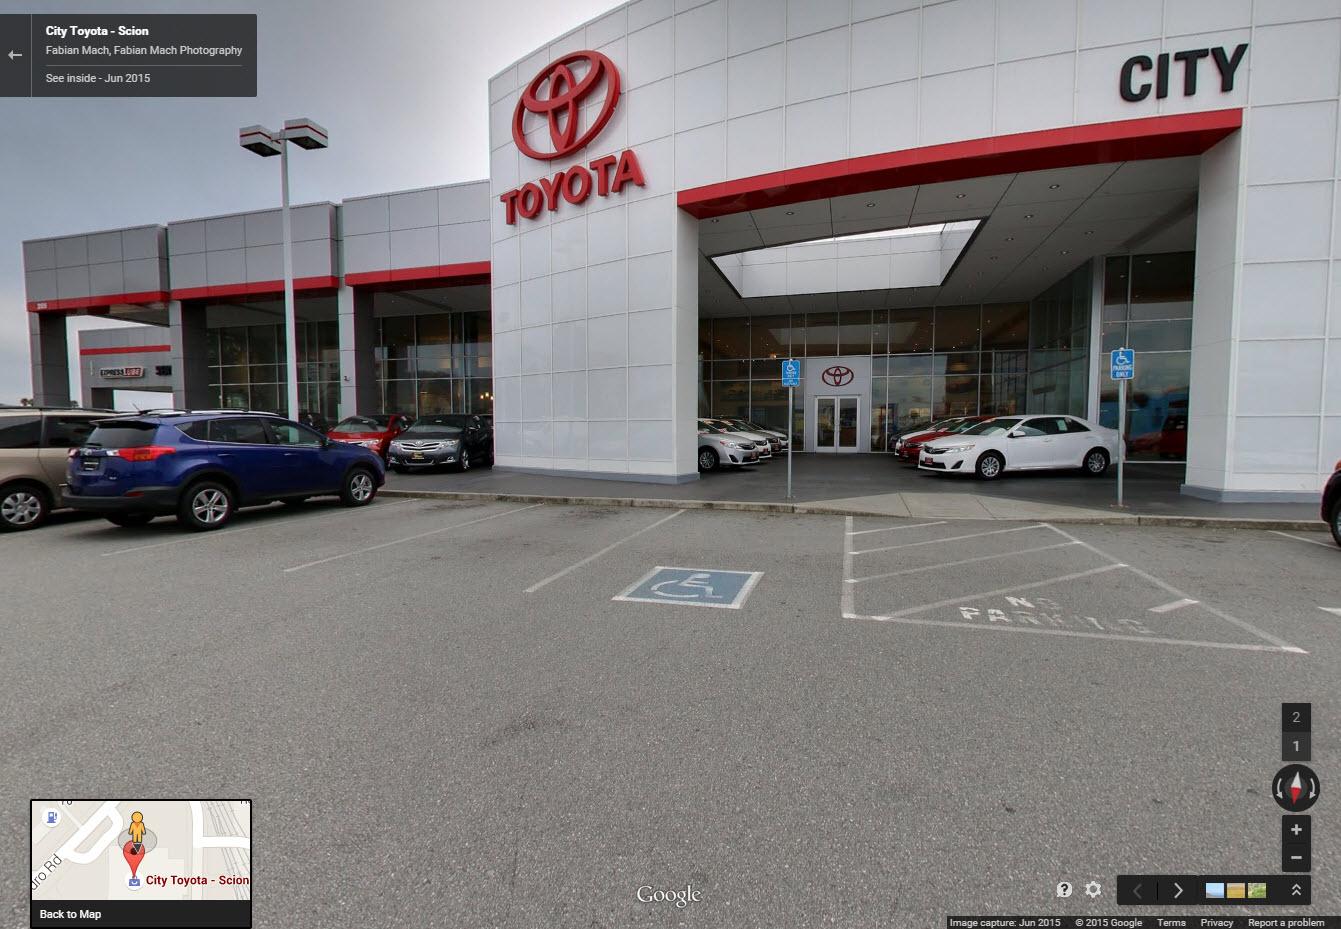 City Toyota-Scion